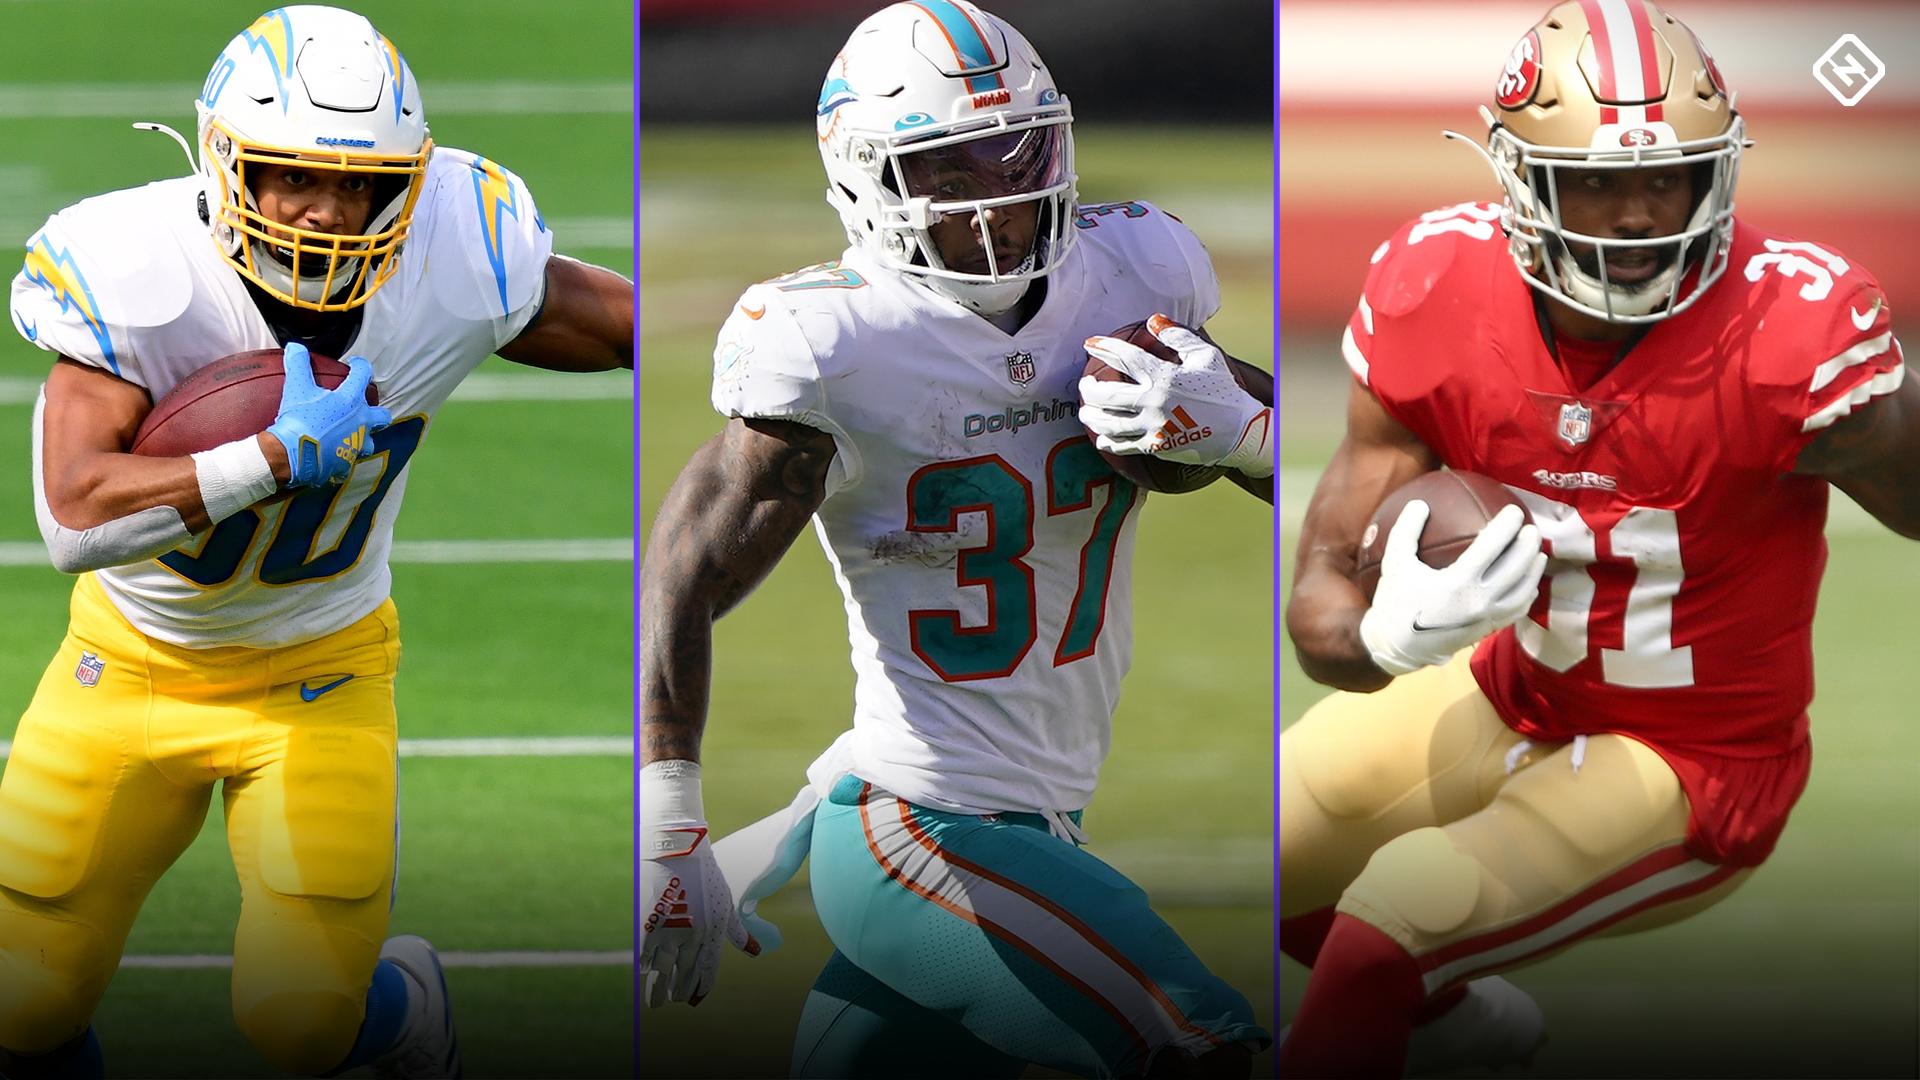 Fantasy Injury Updates: Austin Ekeler, Myles Gaskin, Raheem Mostert, more RBs affecting Week 12 start 'em, sit 'em decisions